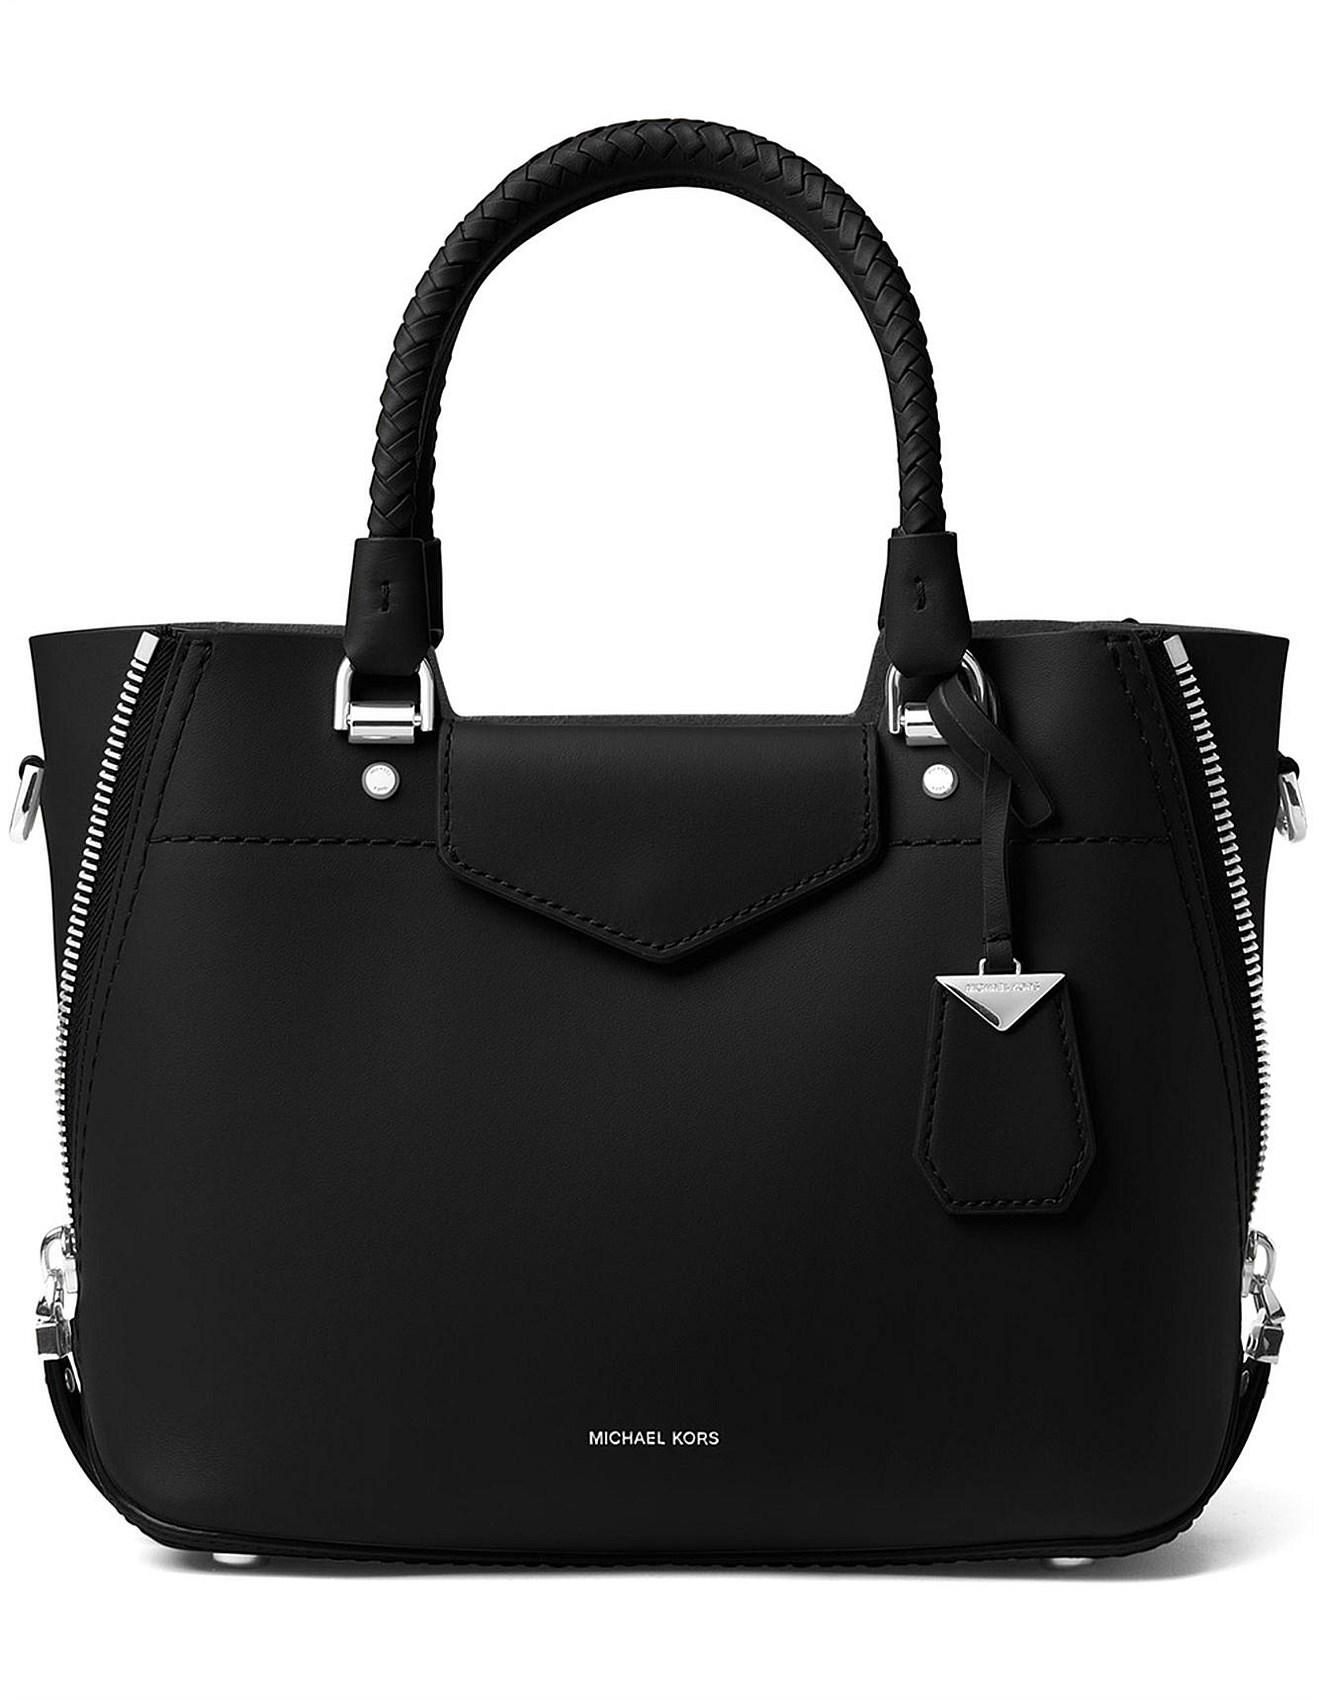 311a4db11c1fda Michael Kors Handbags Sale David Jones   Stanford Center for ...